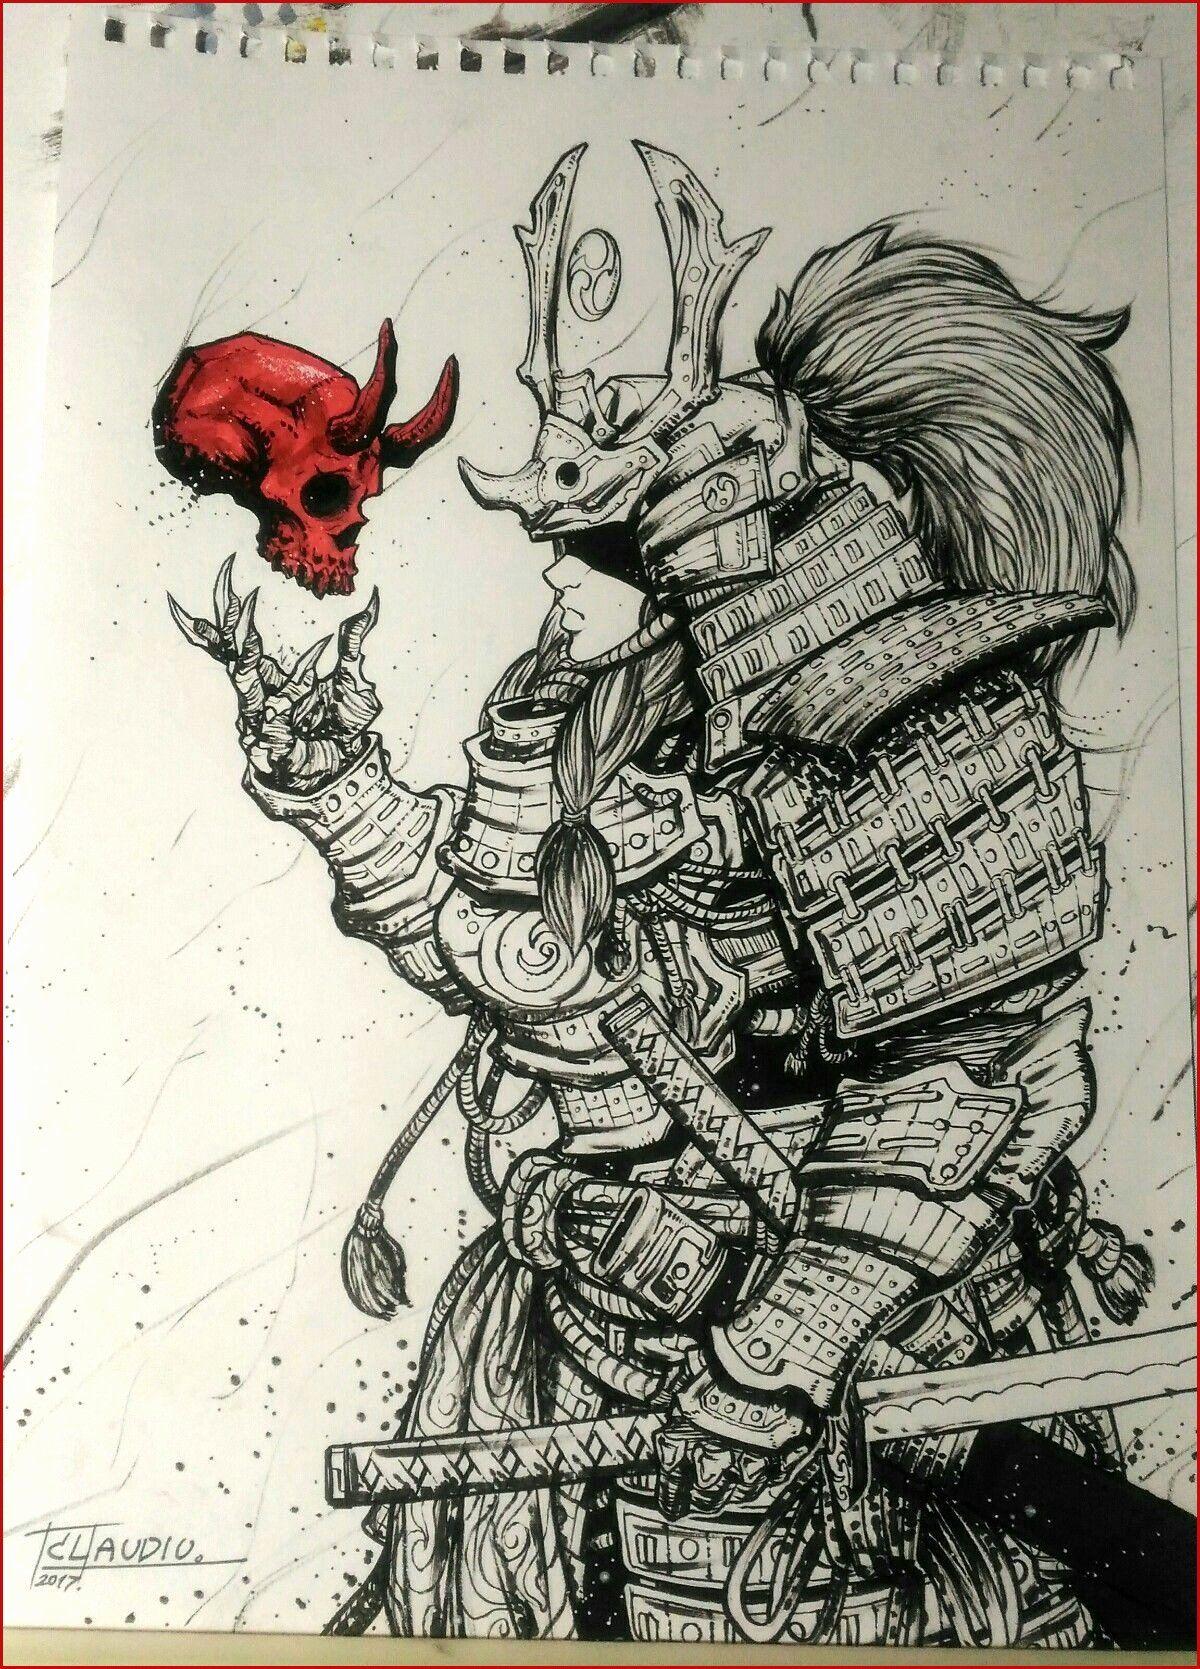 Pin By Randy Sulzer On 캐릭터 디자인 Samurai Drawing Samurai Tattoo Design Samurai Artwork